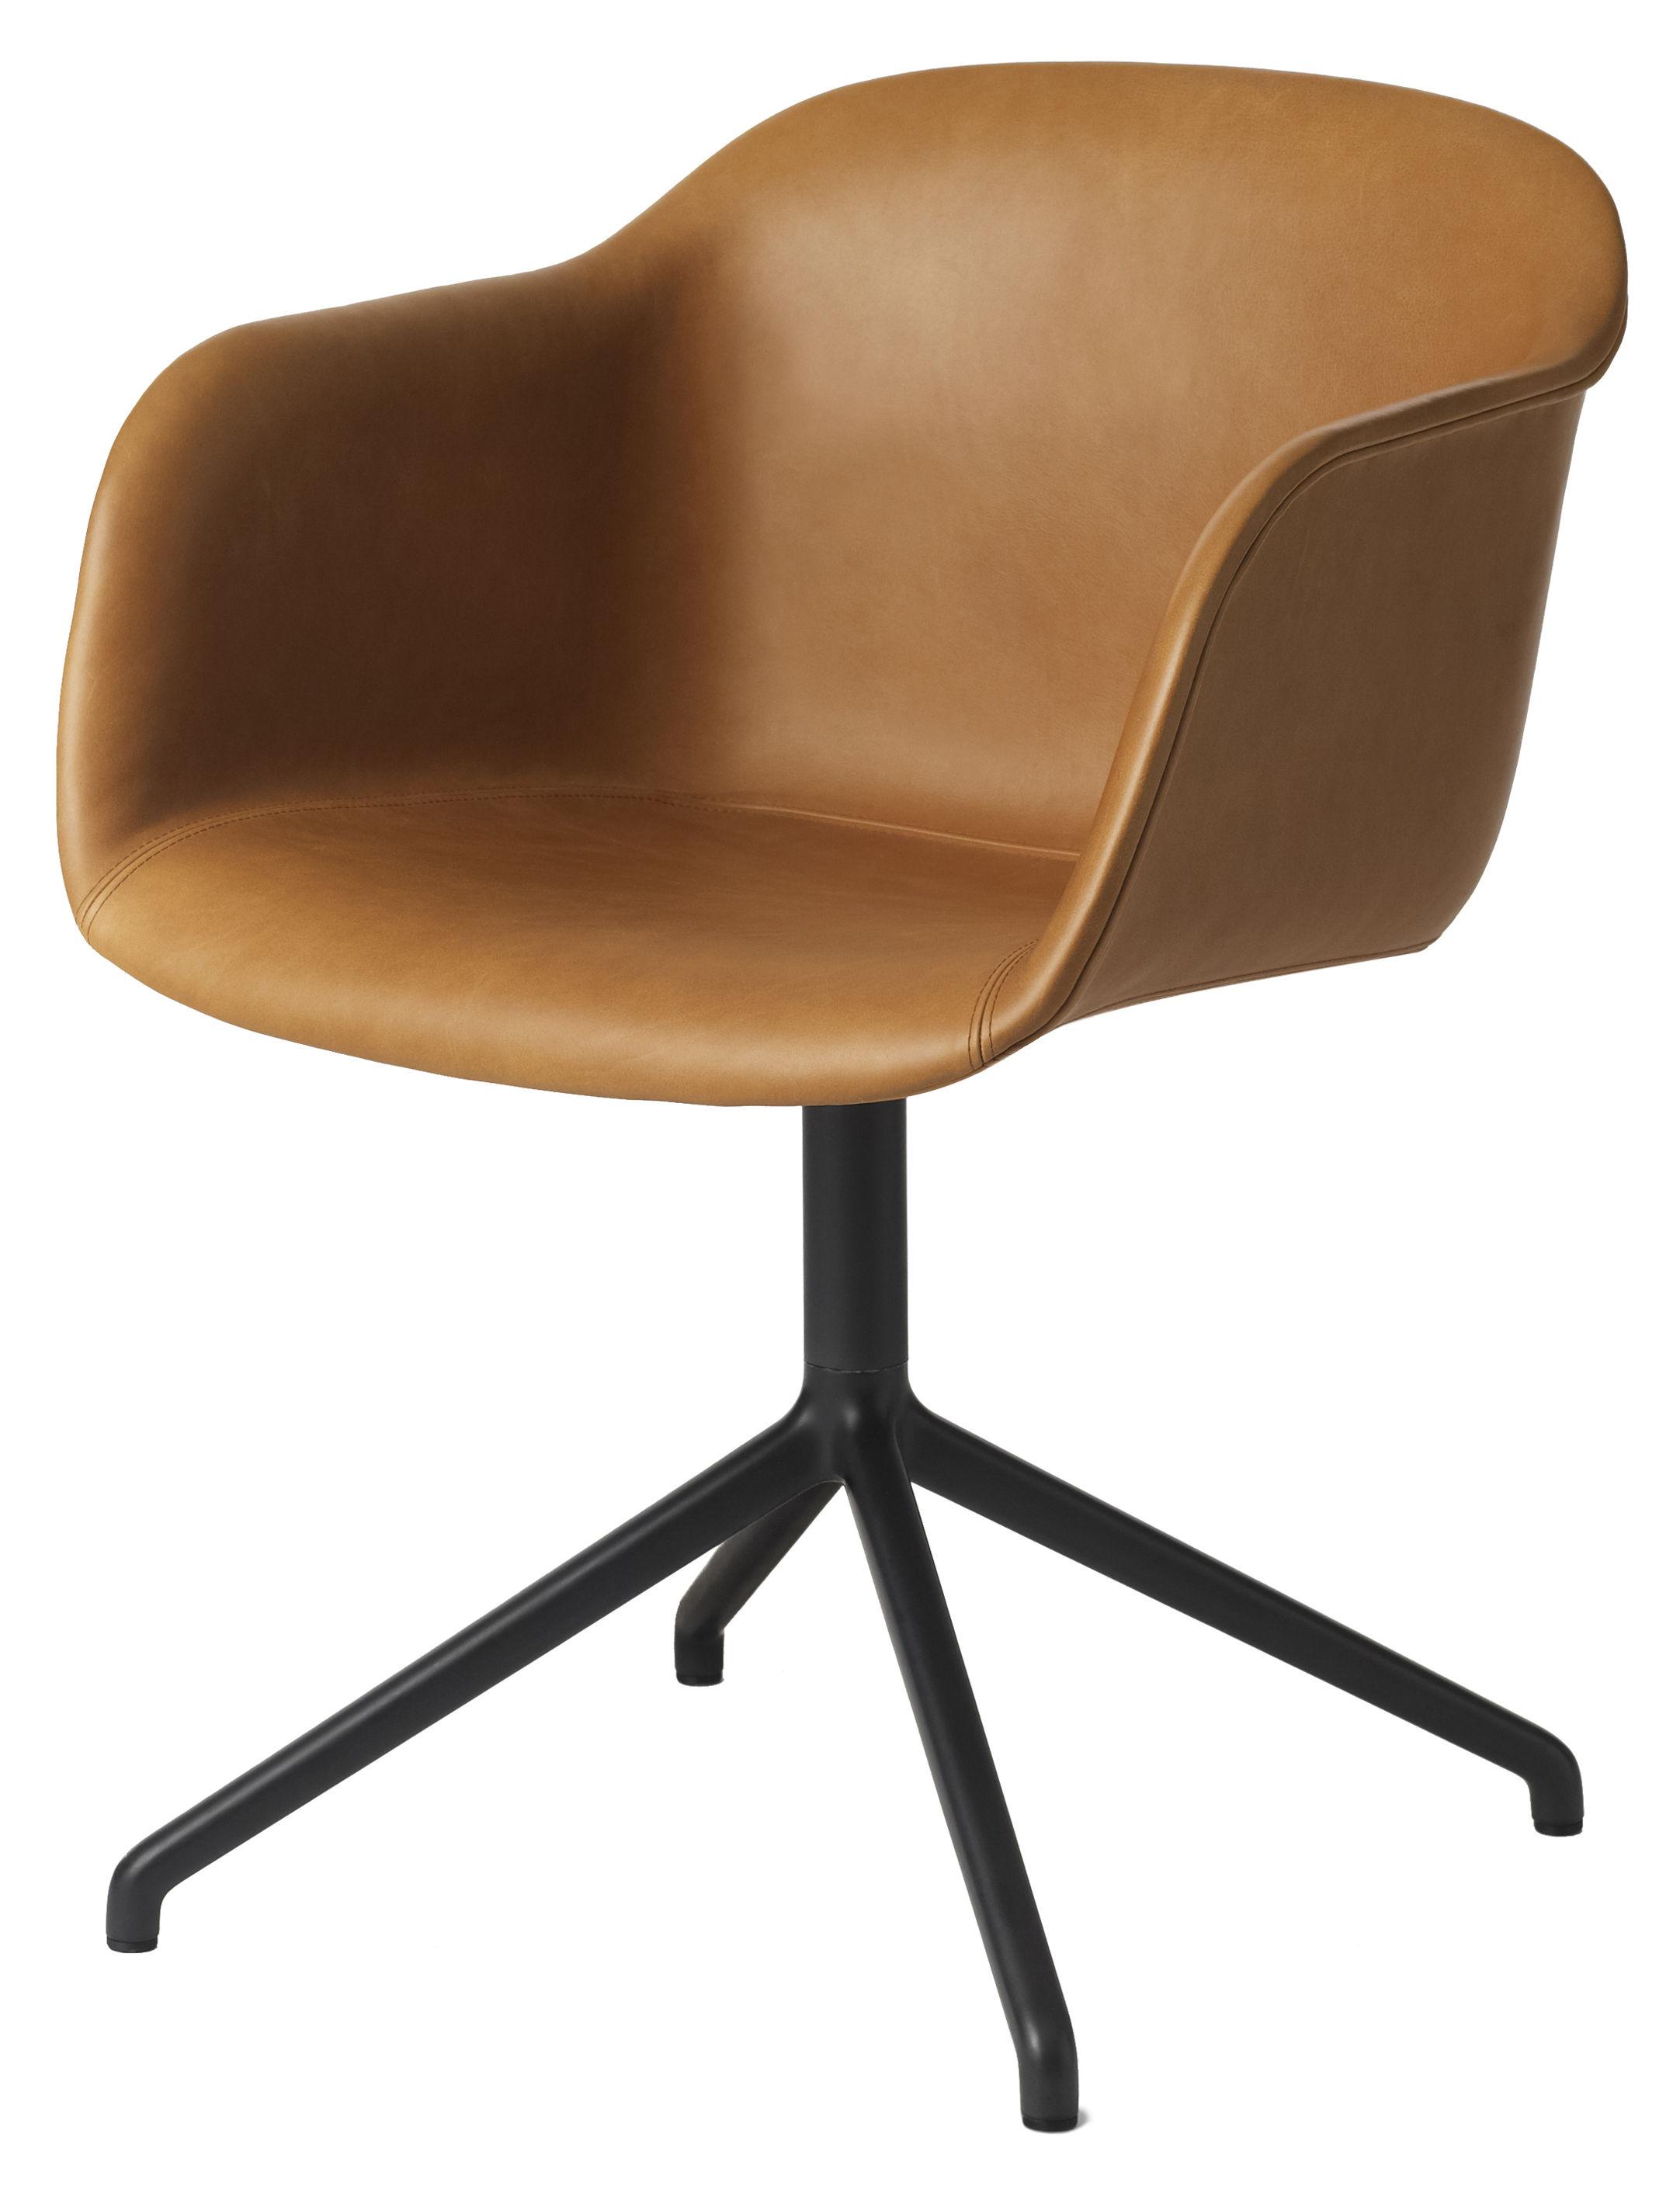 fiber drehstuhl leder muuto sessel. Black Bedroom Furniture Sets. Home Design Ideas